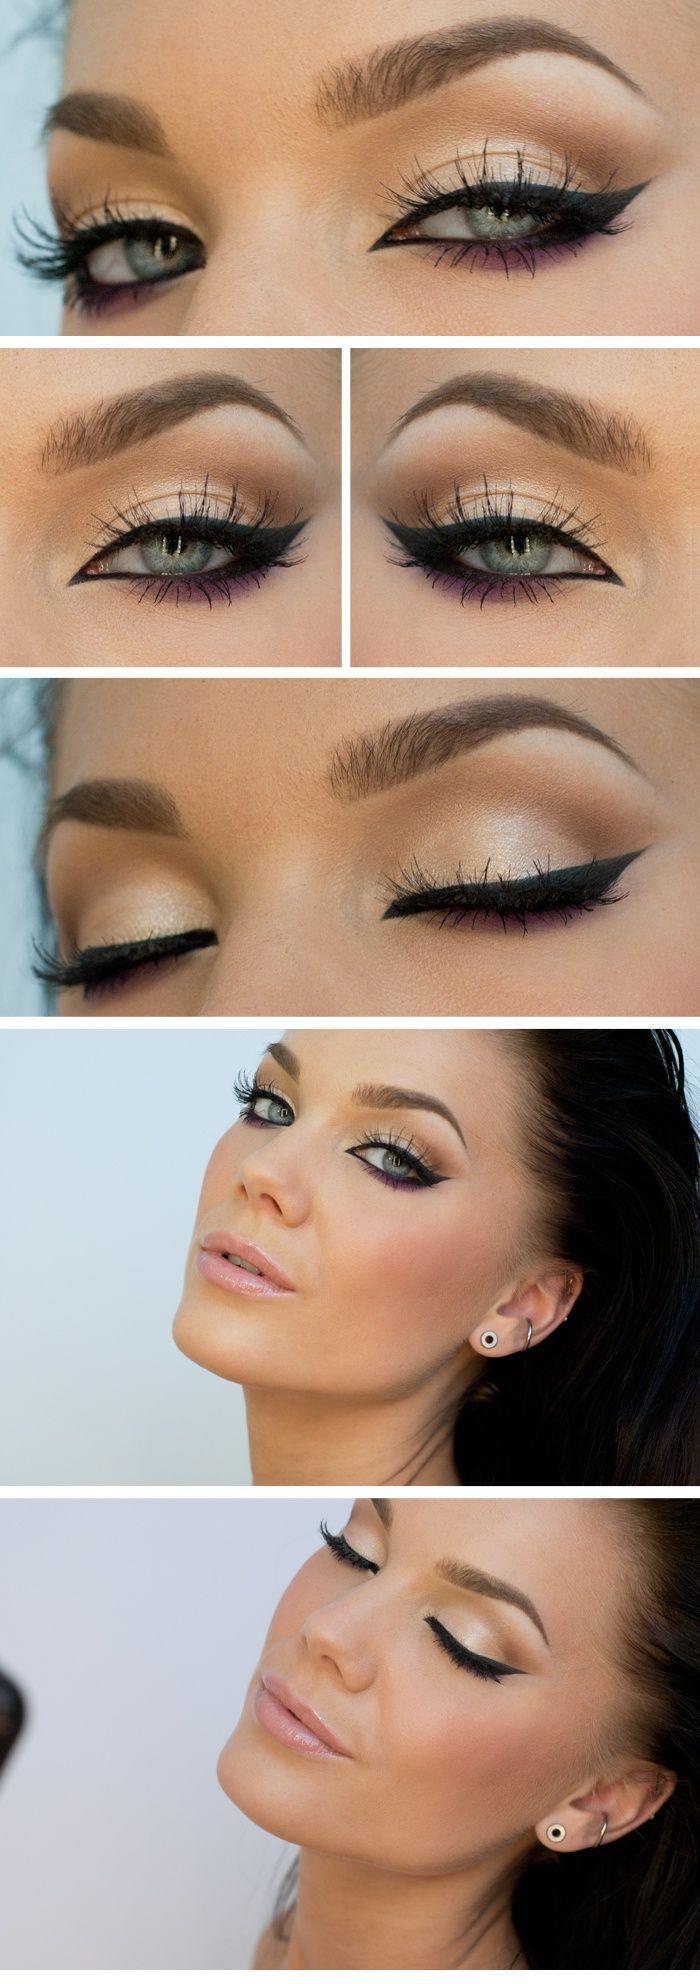 Hochzeit - Cool Eyeliner Styles To Make Your Look Edgier